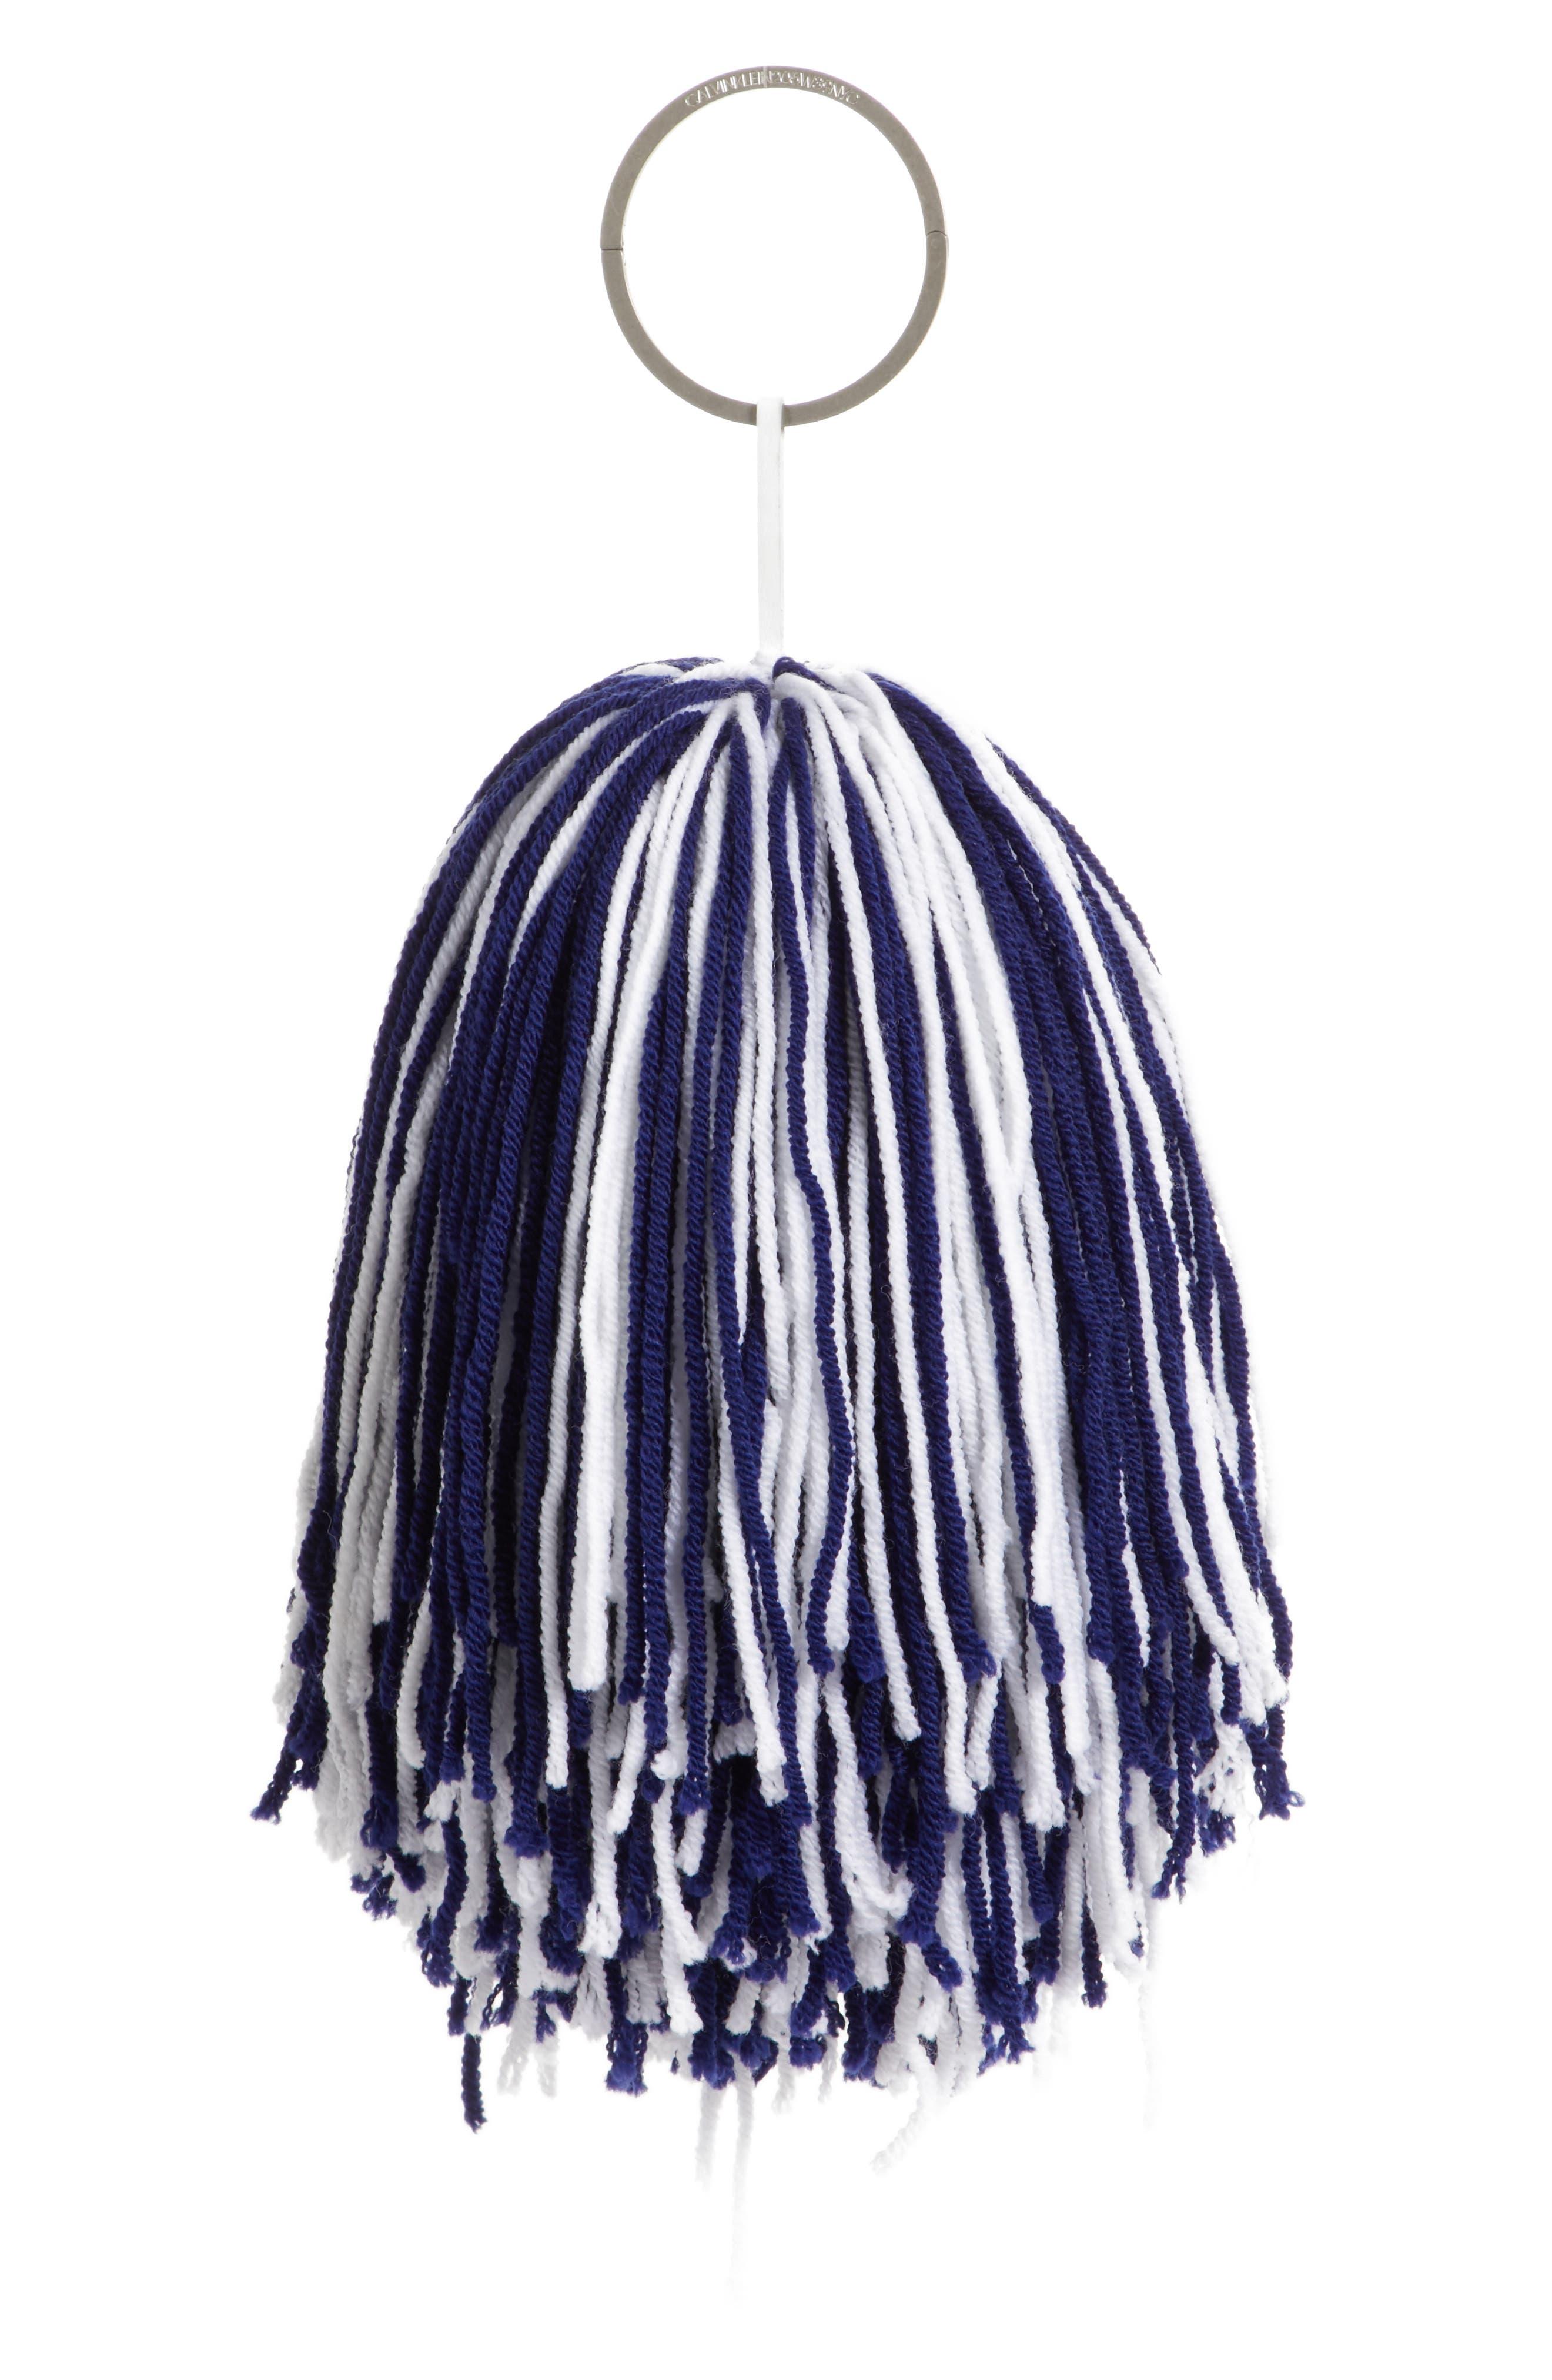 Pompom Bag Charm,                             Main thumbnail 1, color,                             ROYAL BLUE/ WHITE